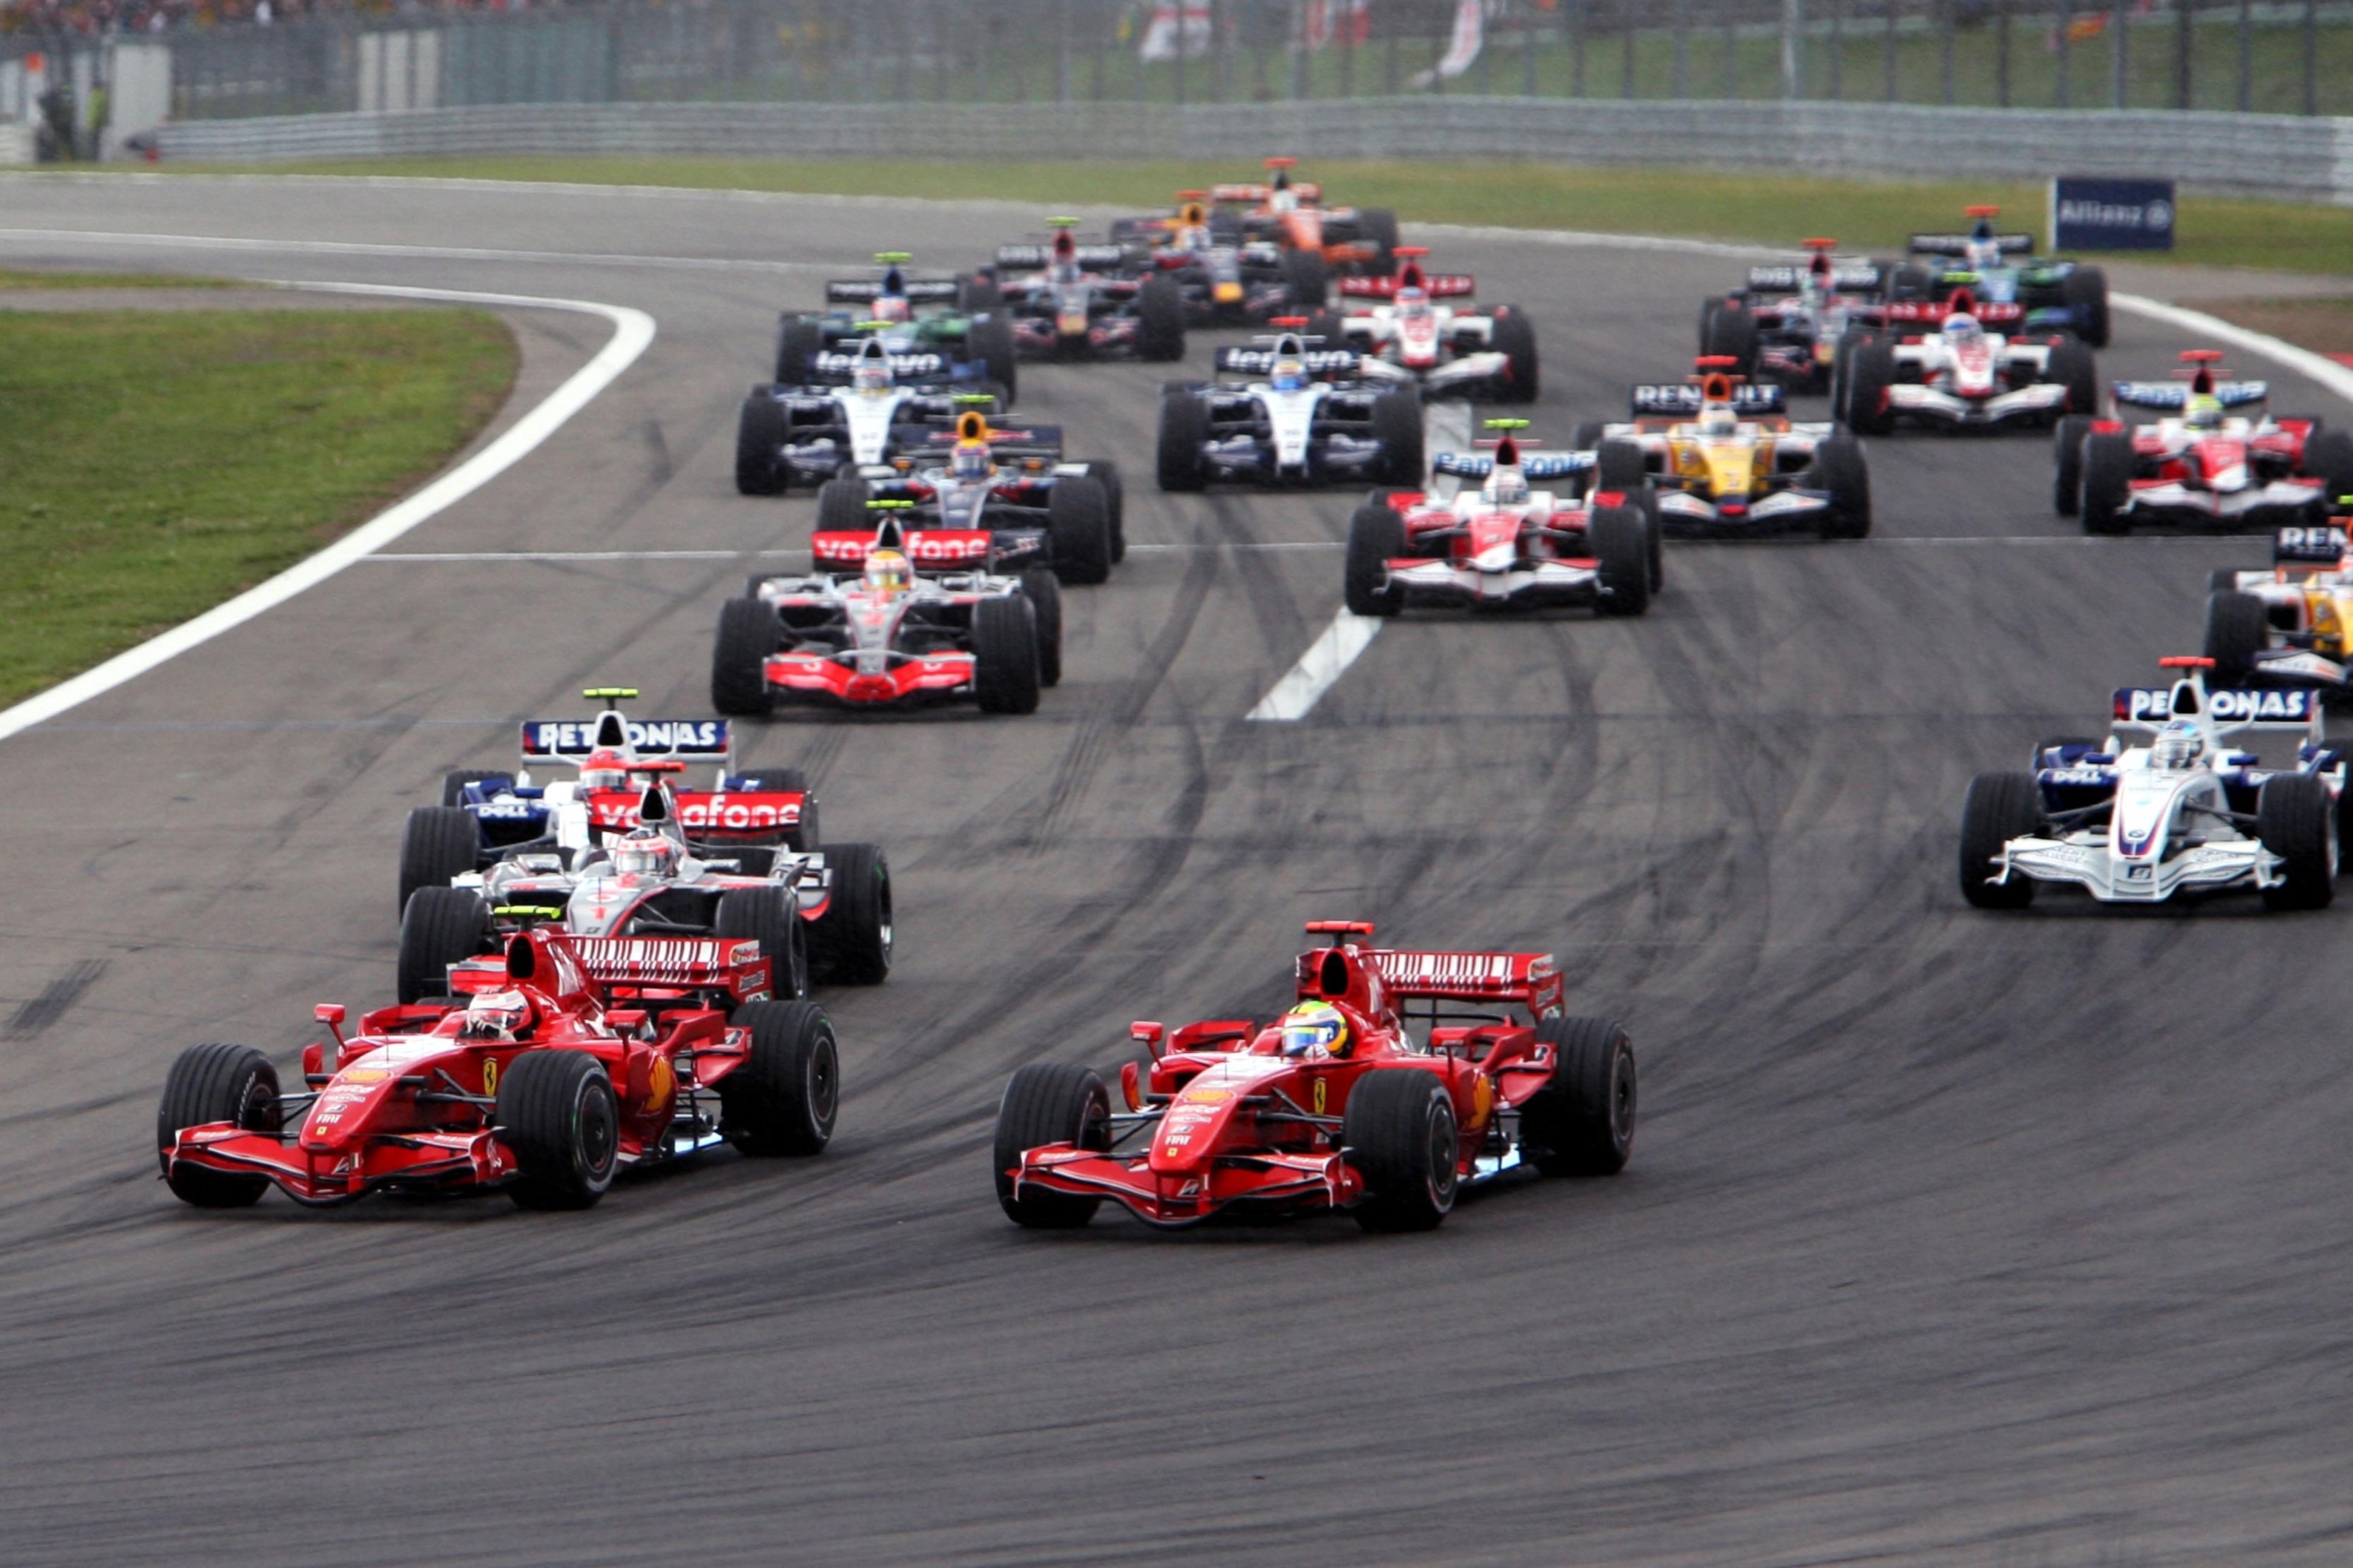 2007 European Grand Prix start